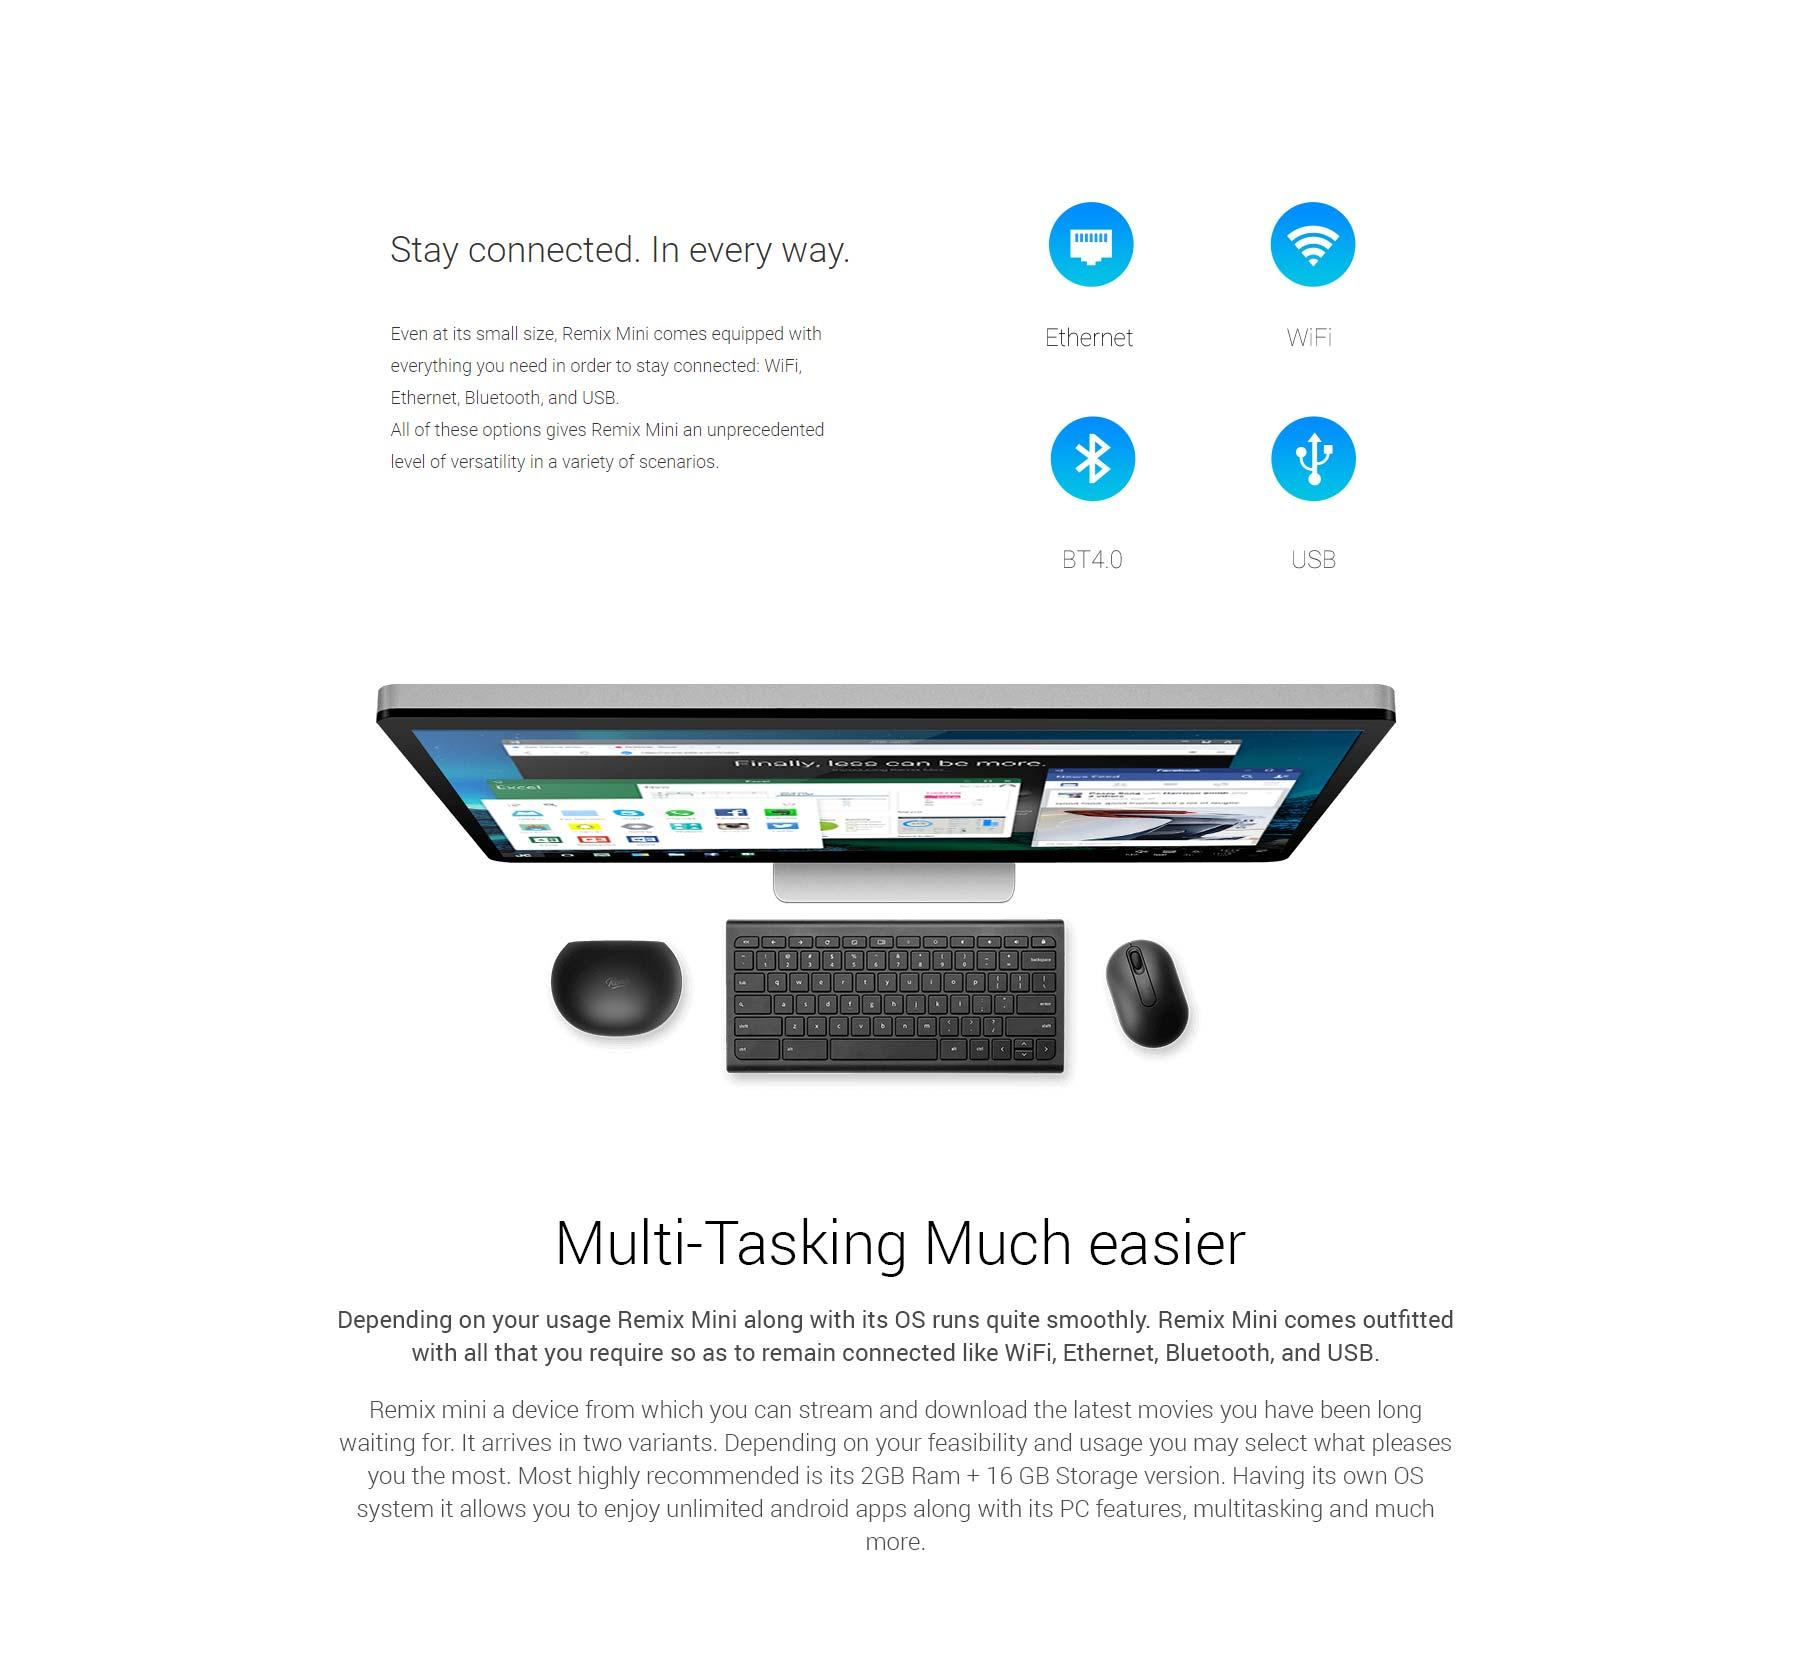 REMIX MINI WITH KEYBOARD (Smart TV, Gaming Station & Desktop PC )